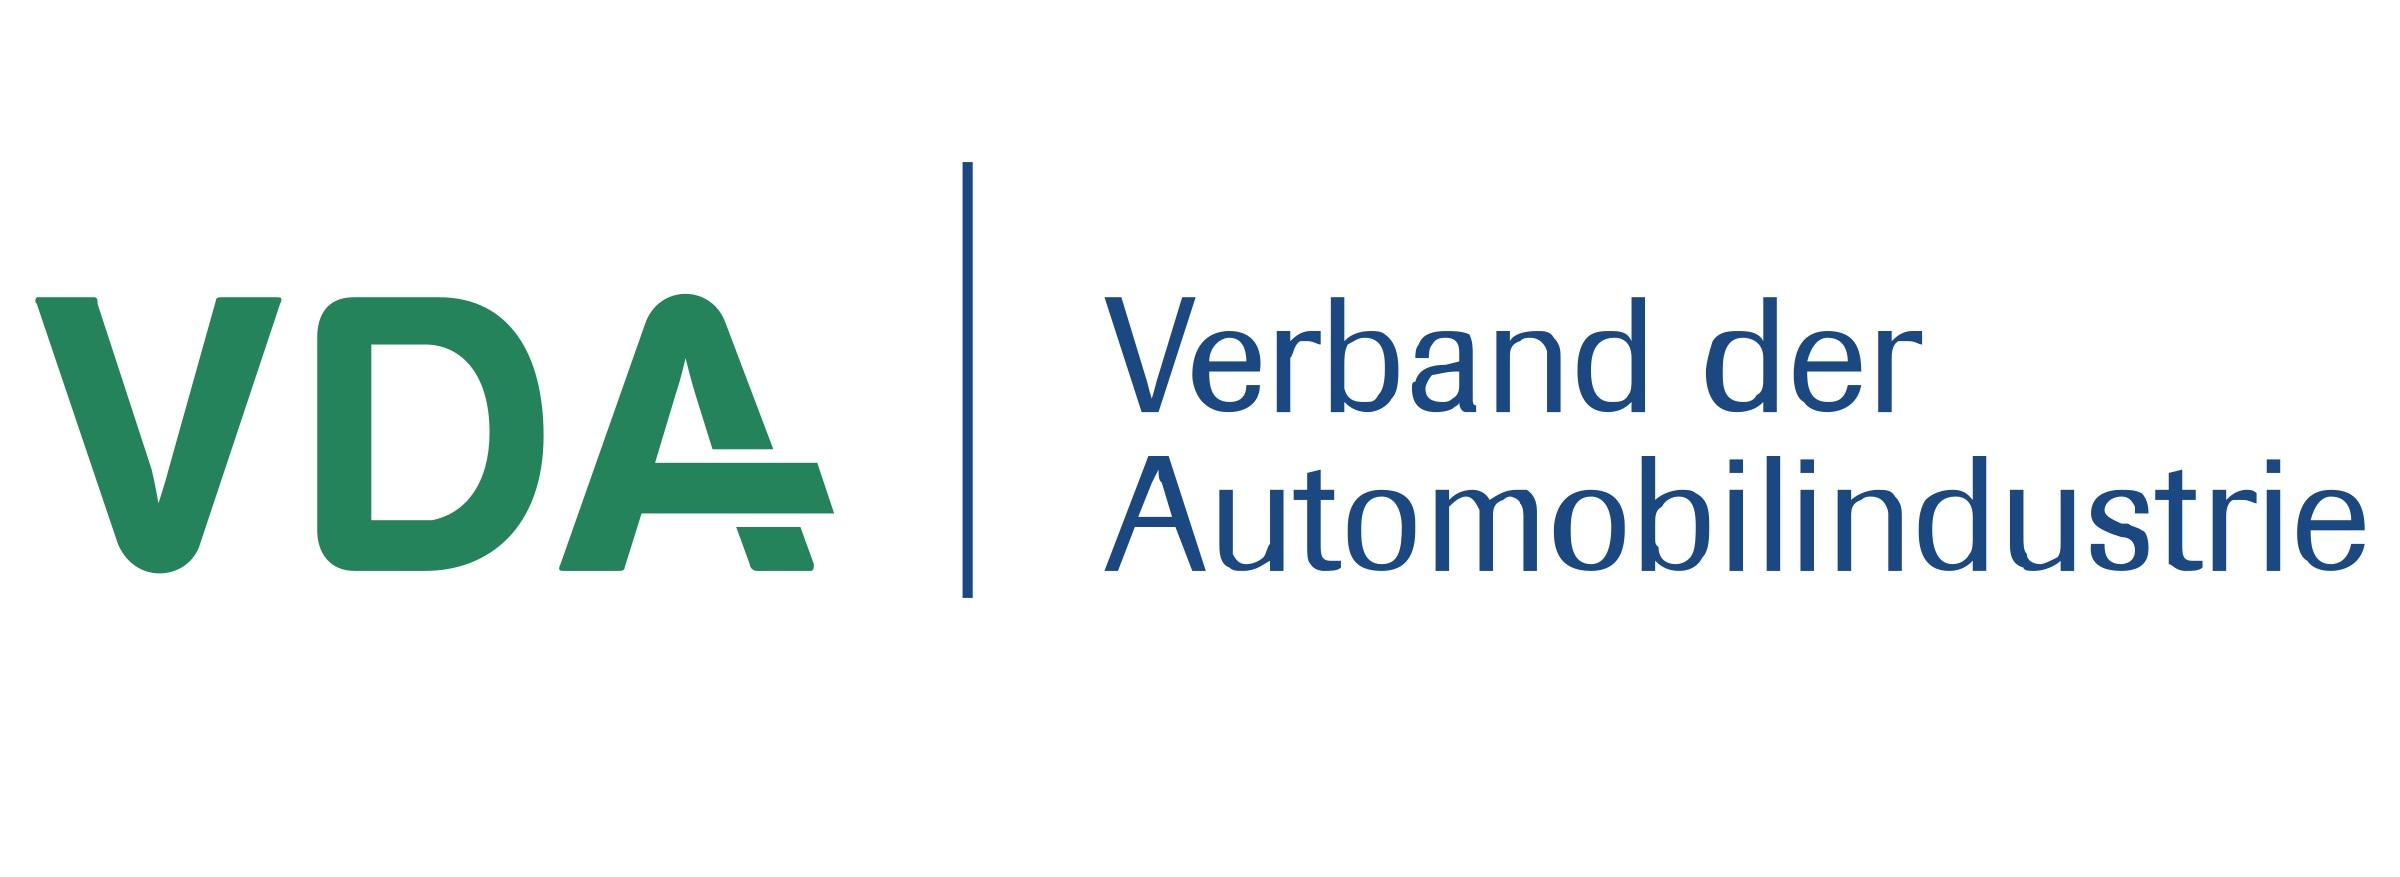 vda-logo-png-transparent.jpg